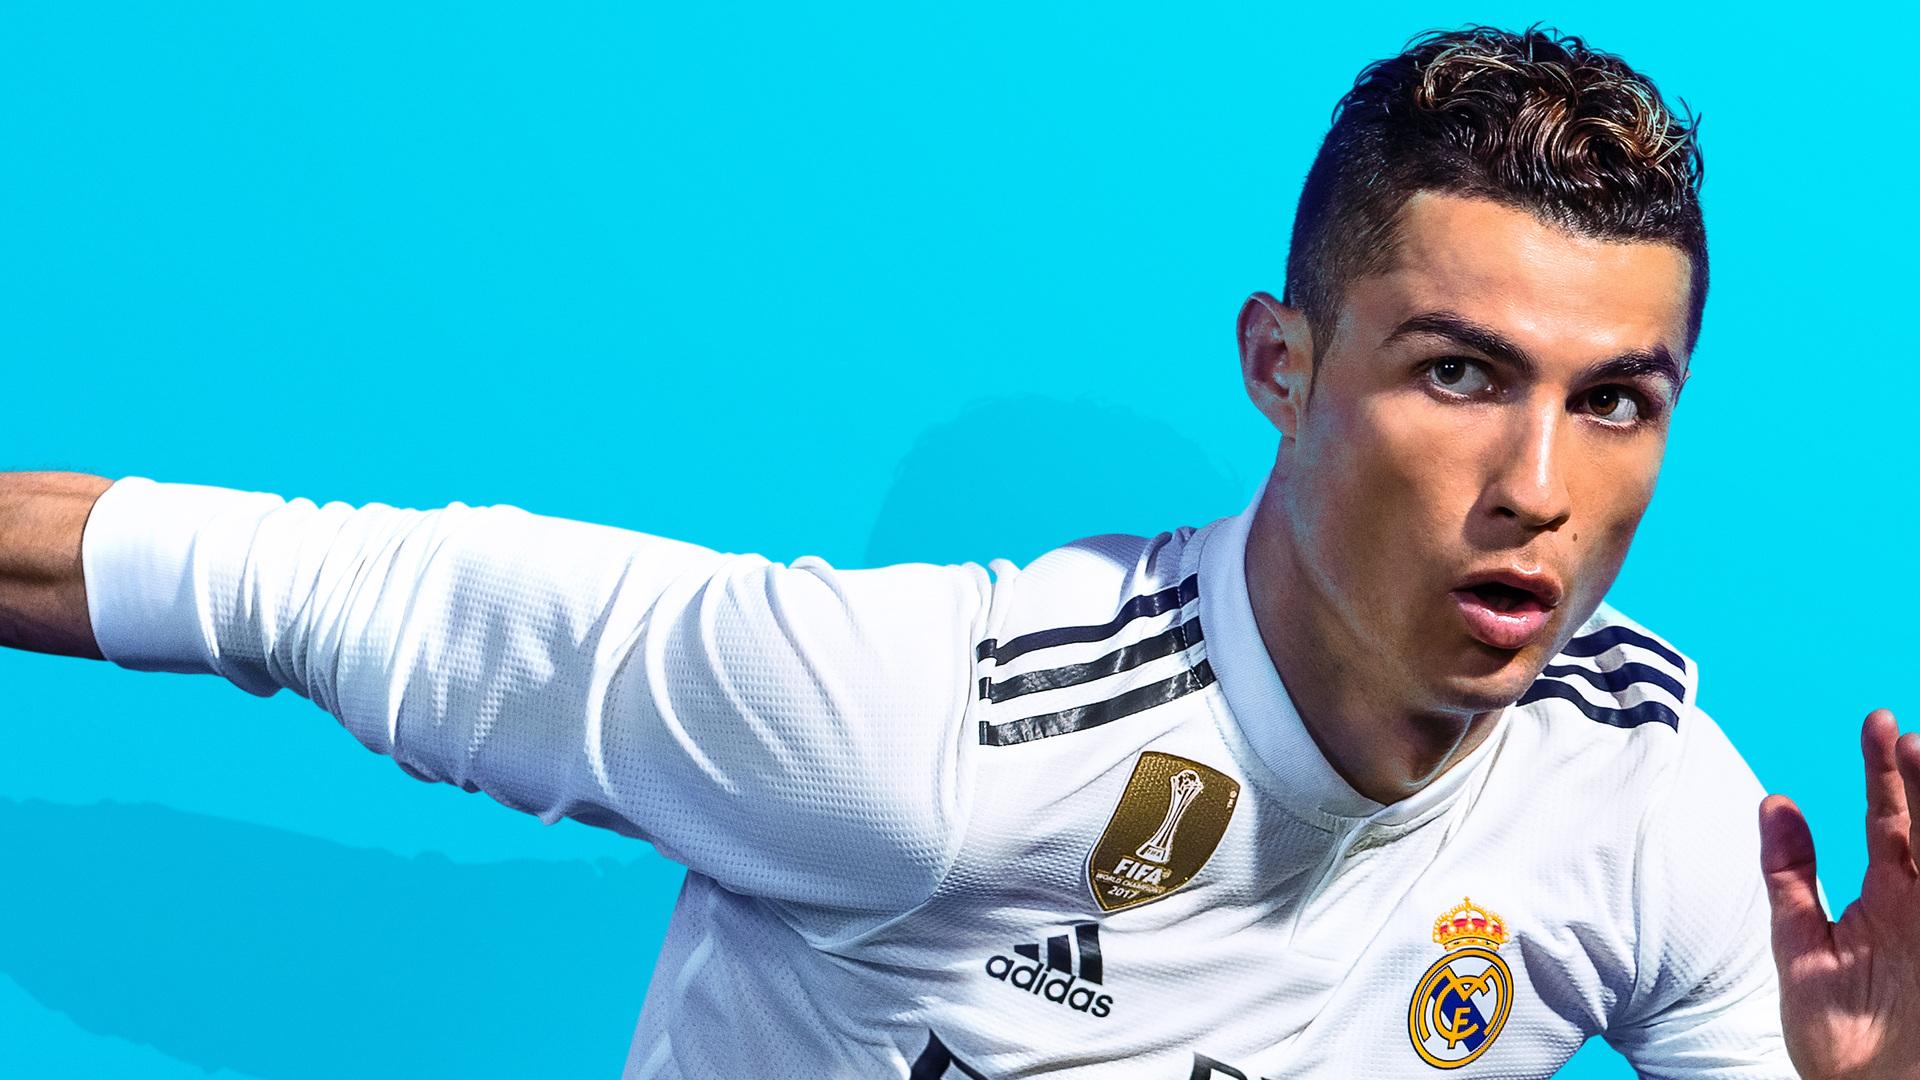 1920x1080 Cristiano Ronaldo FIFA 19 8k Laptop Full HD